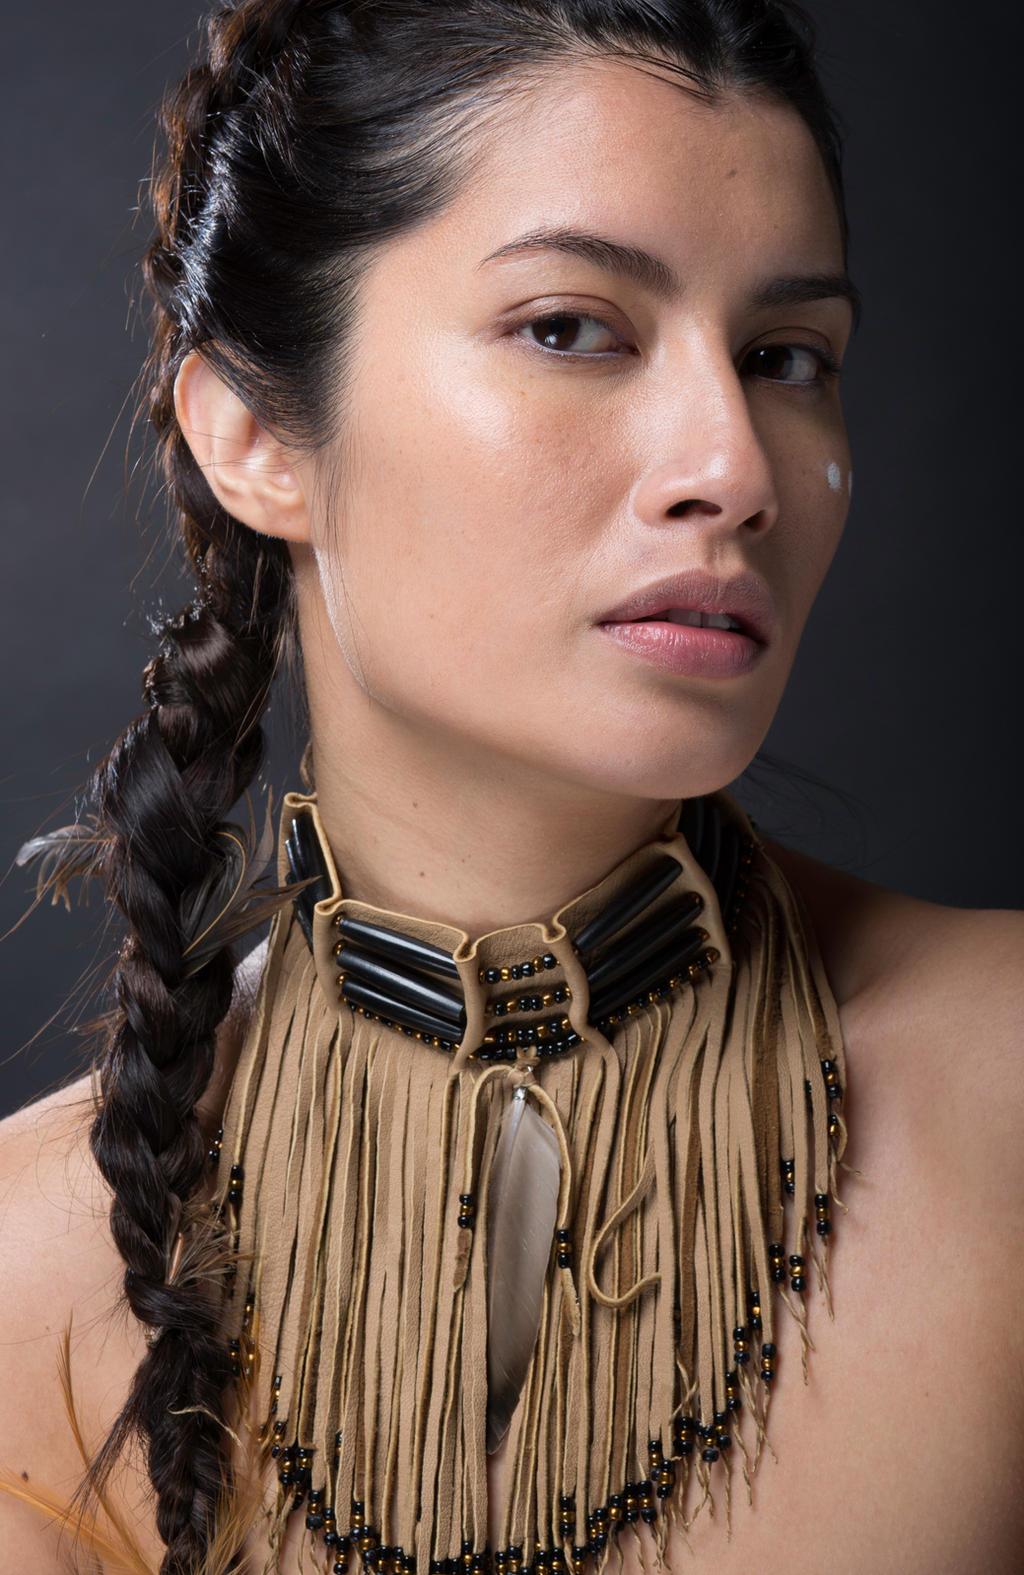 http://img14.deviantart.net/73b6/i/2014/155/0/d/native_american_leather_fringed_choker_on_model_by_tribalterri-d7l0rue.jpg American